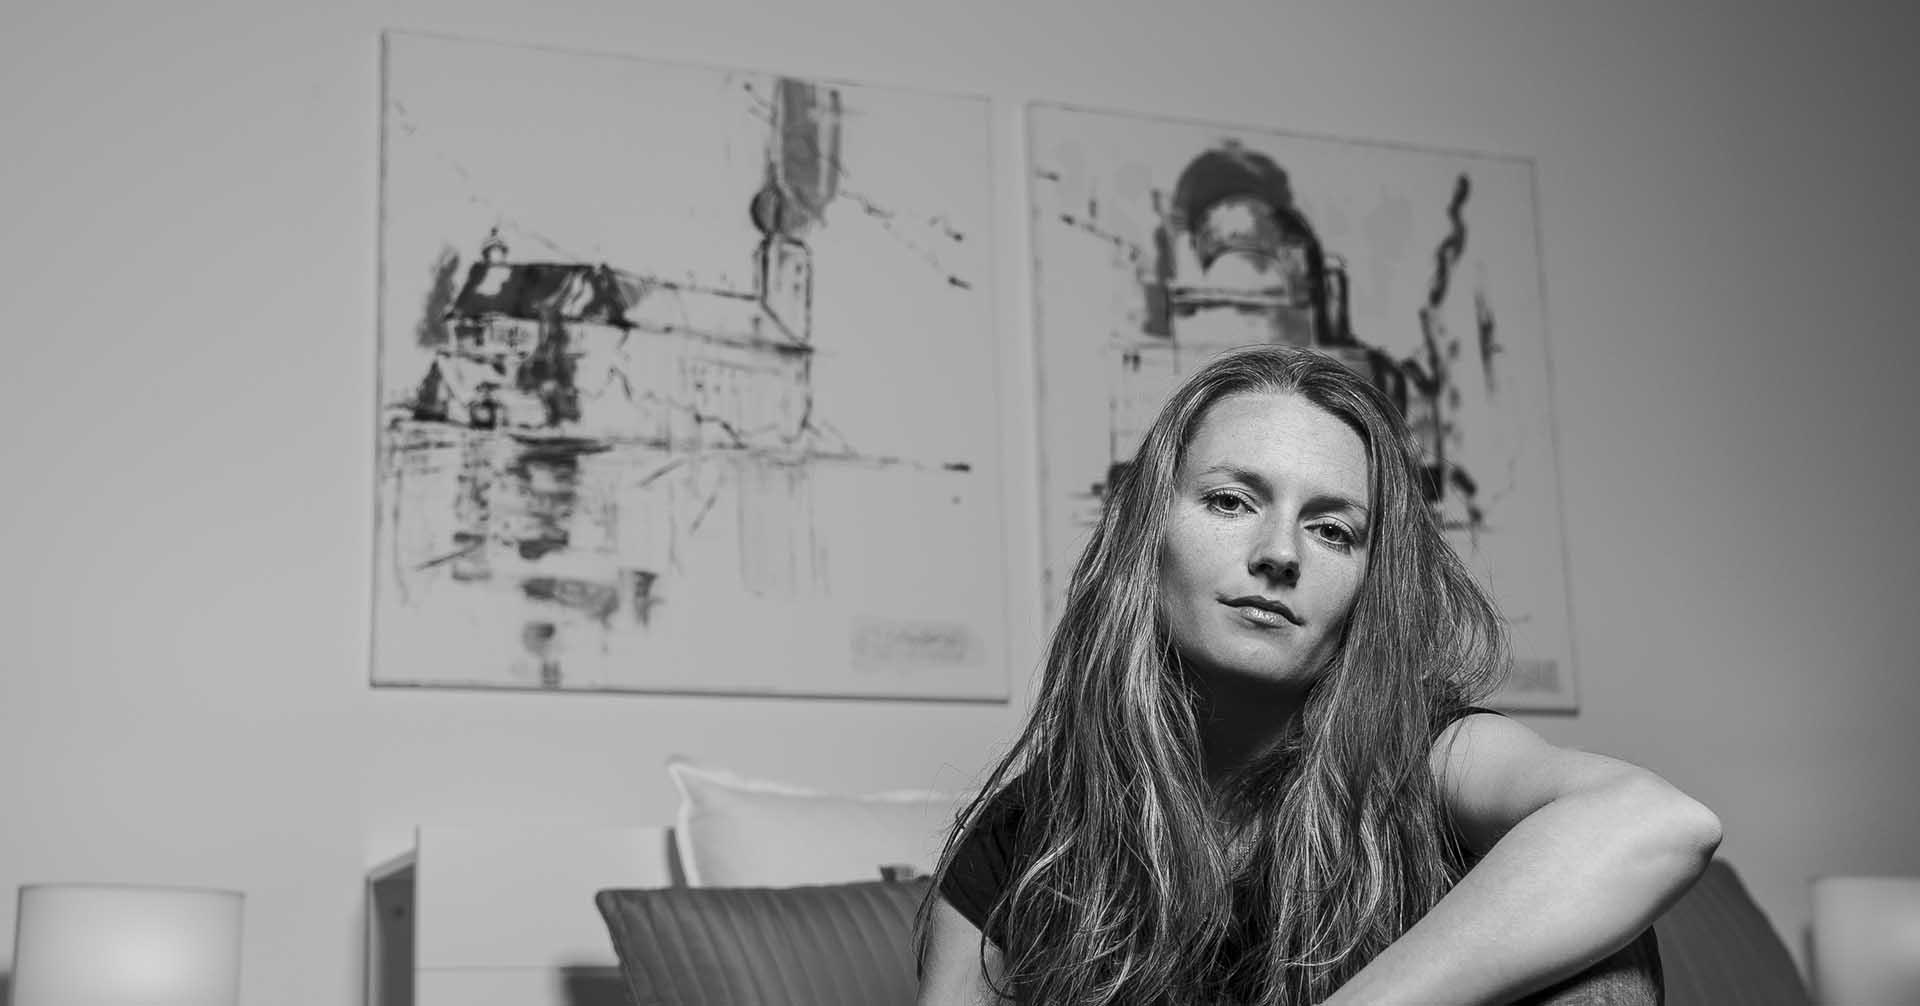 Portraits von Thönerfilm Starnberg